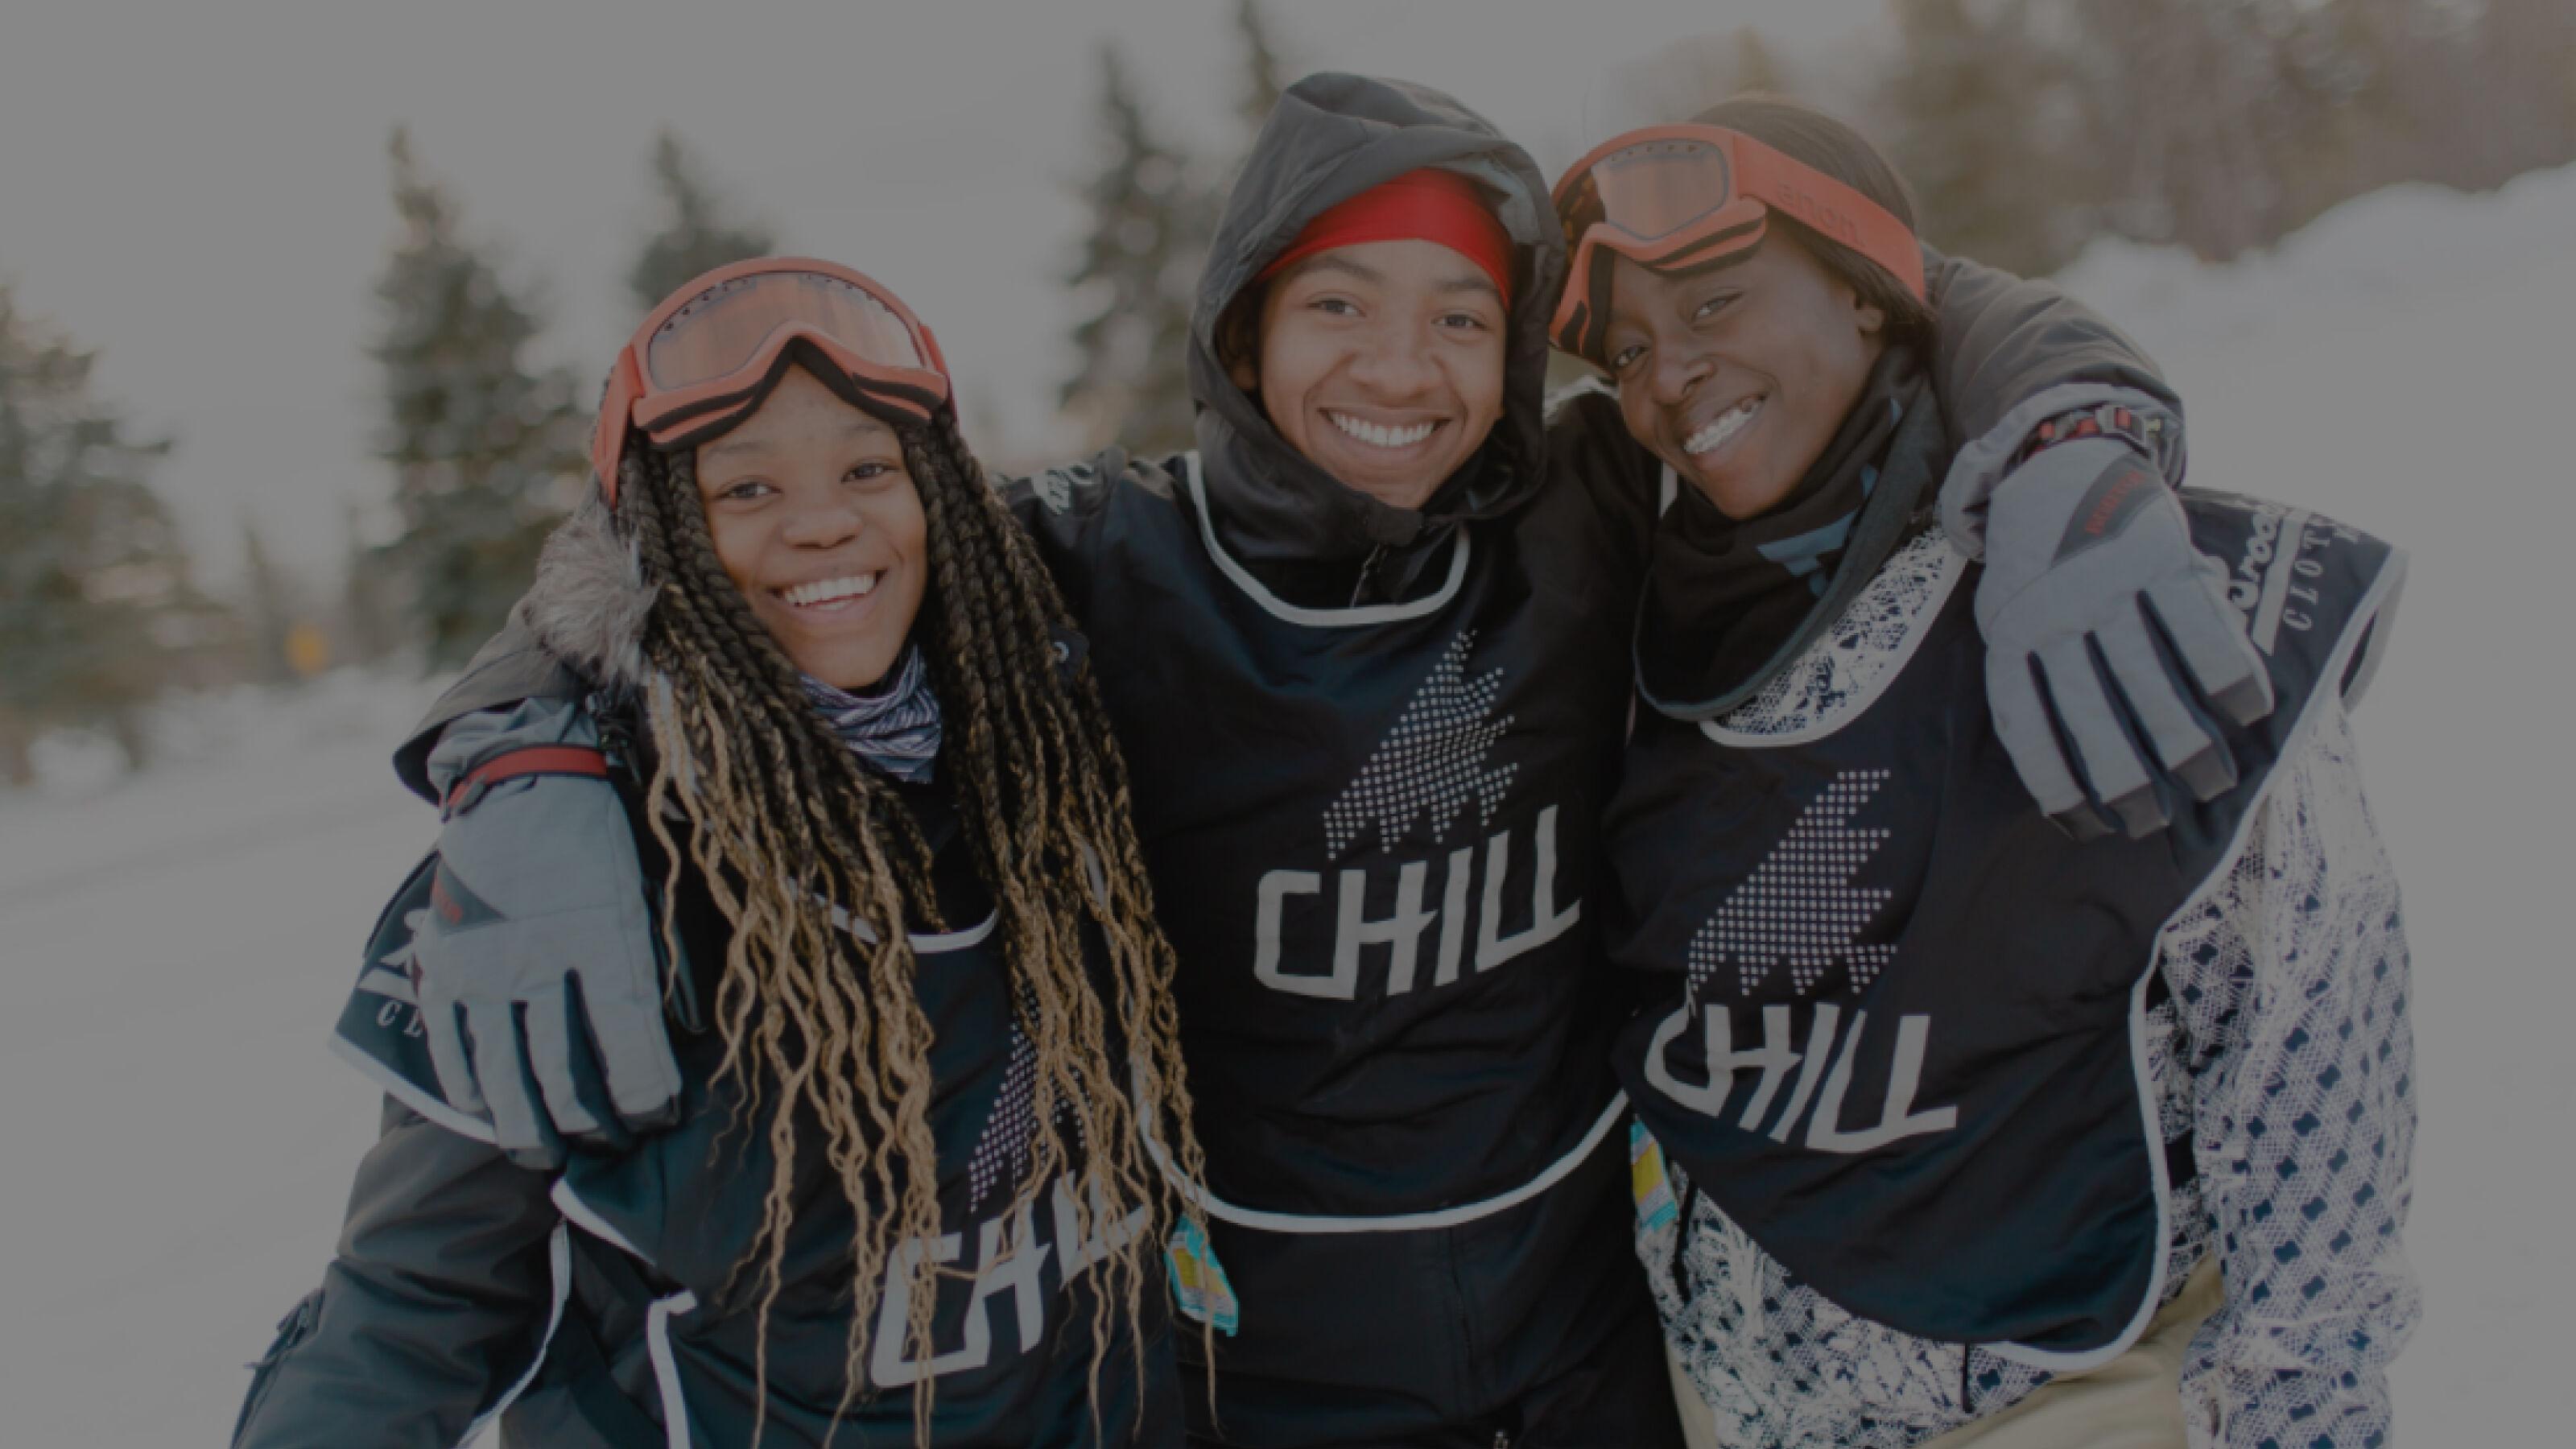 Burton X Chill: Give the Gift of Snowboarding | Burton